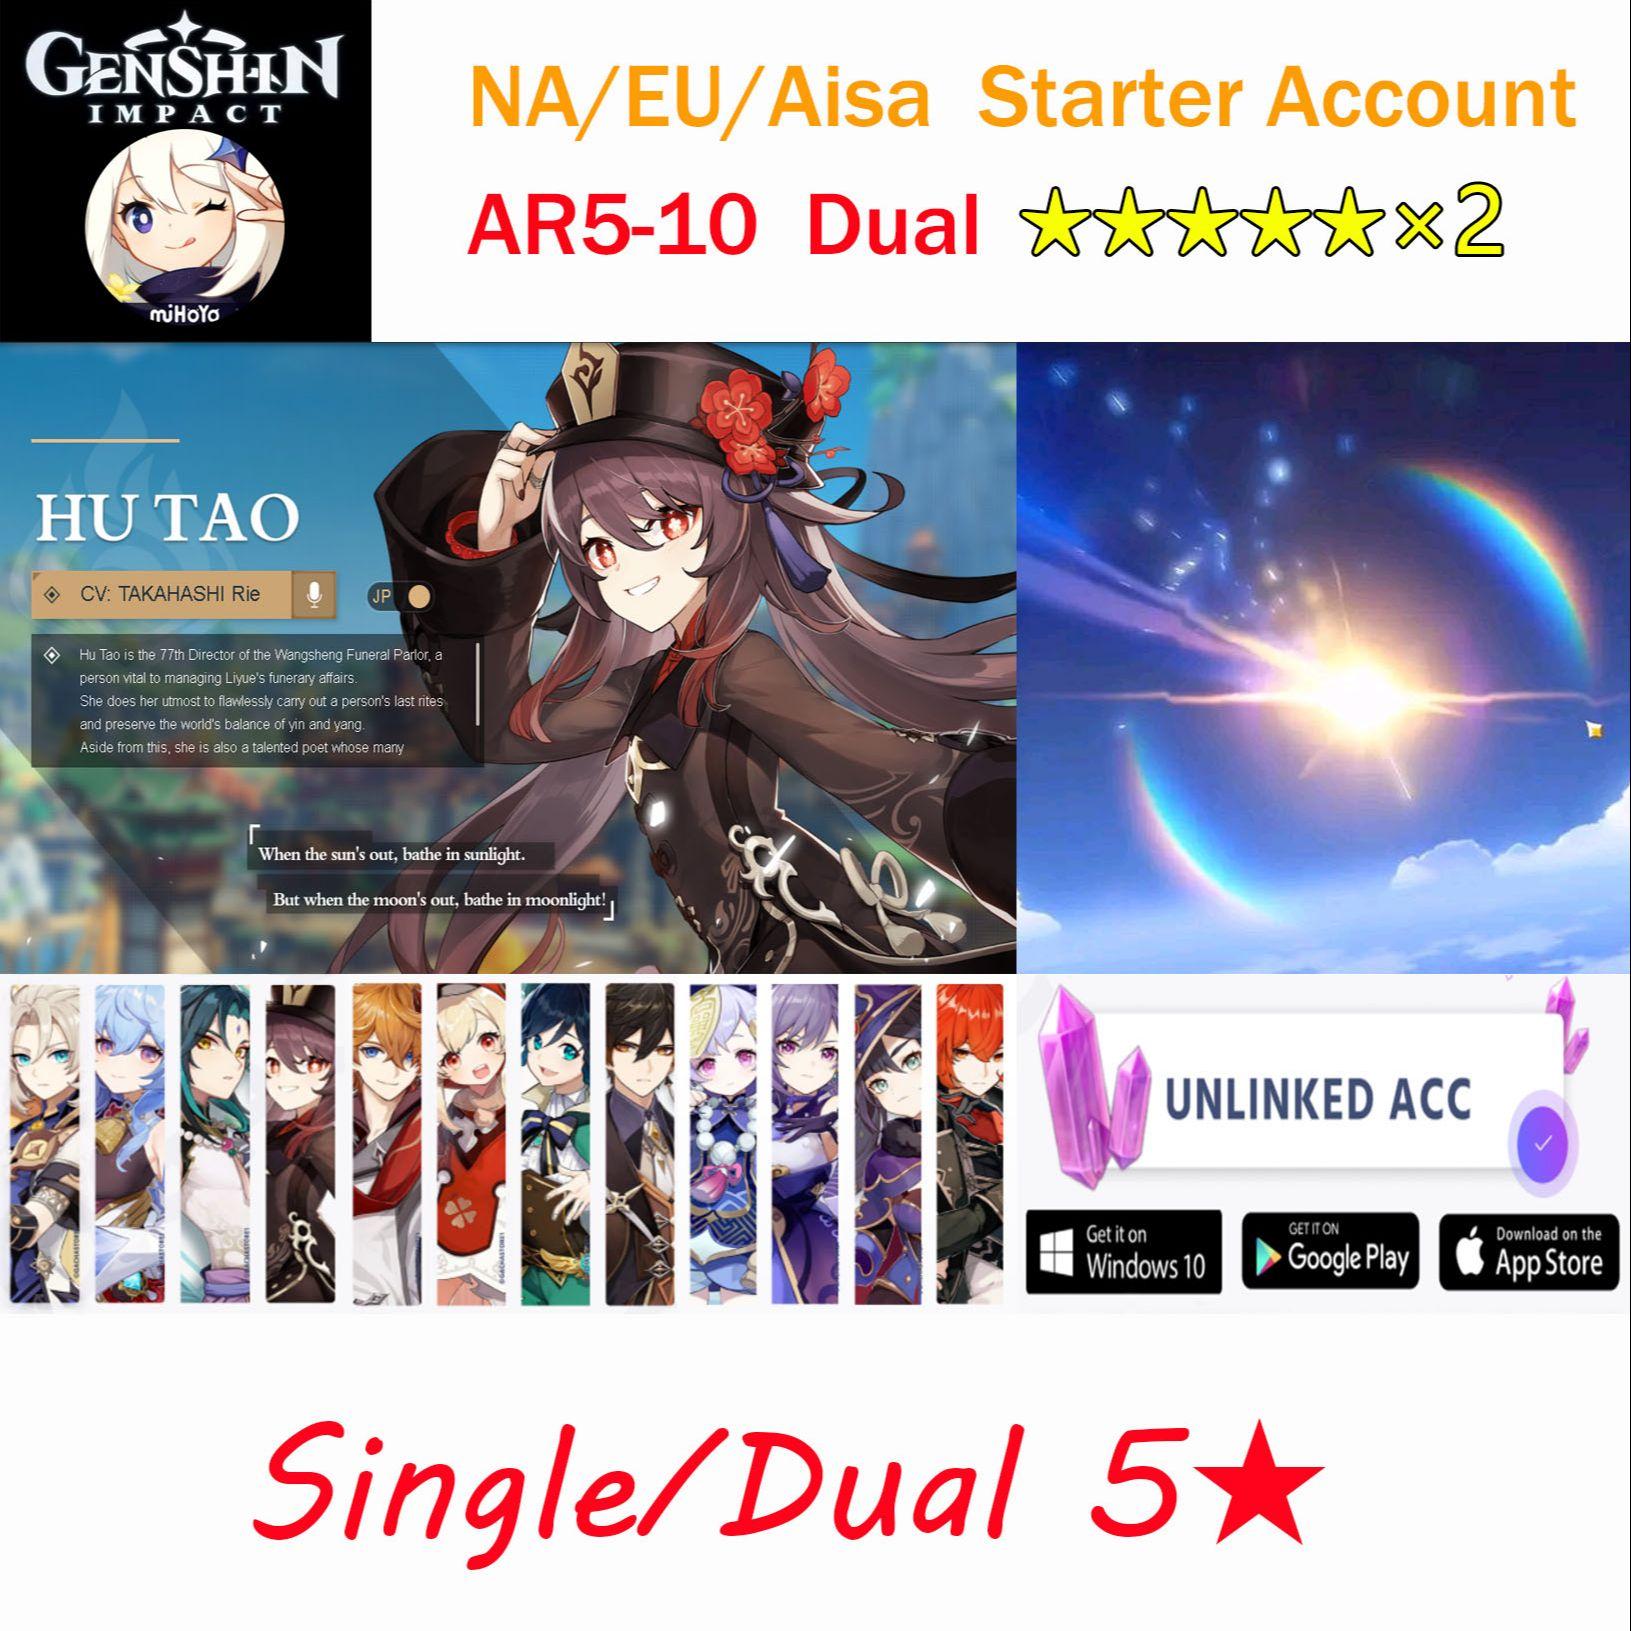 Genshin impact Account Hutao Zhongli Venti Klee Tartaglia Childe Albedo Ganyu Xiao Diluc AR5-10 Asia/America/Europe Starter